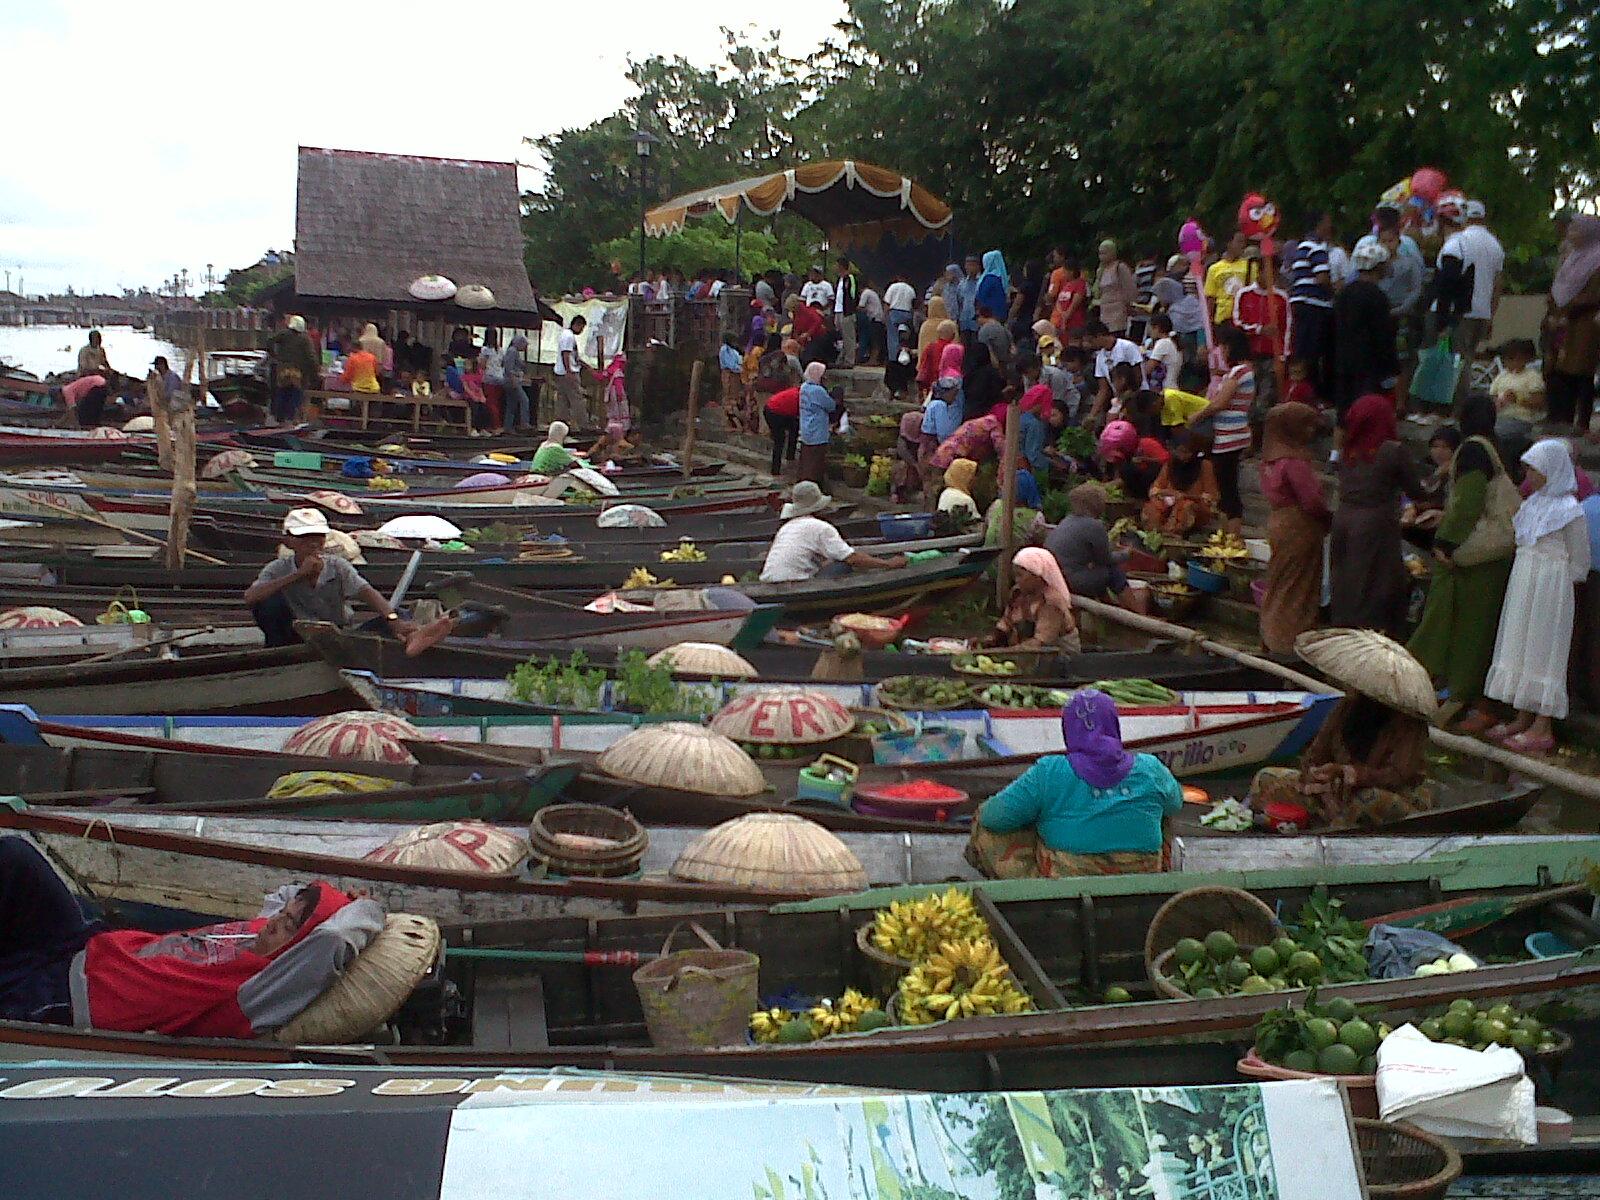 http://upload.wikimedia.org/wikipedia/commons/d/d1/Pasar_Terapung_Siring_Piere_Tendean_di_Banjarmasin.jpg